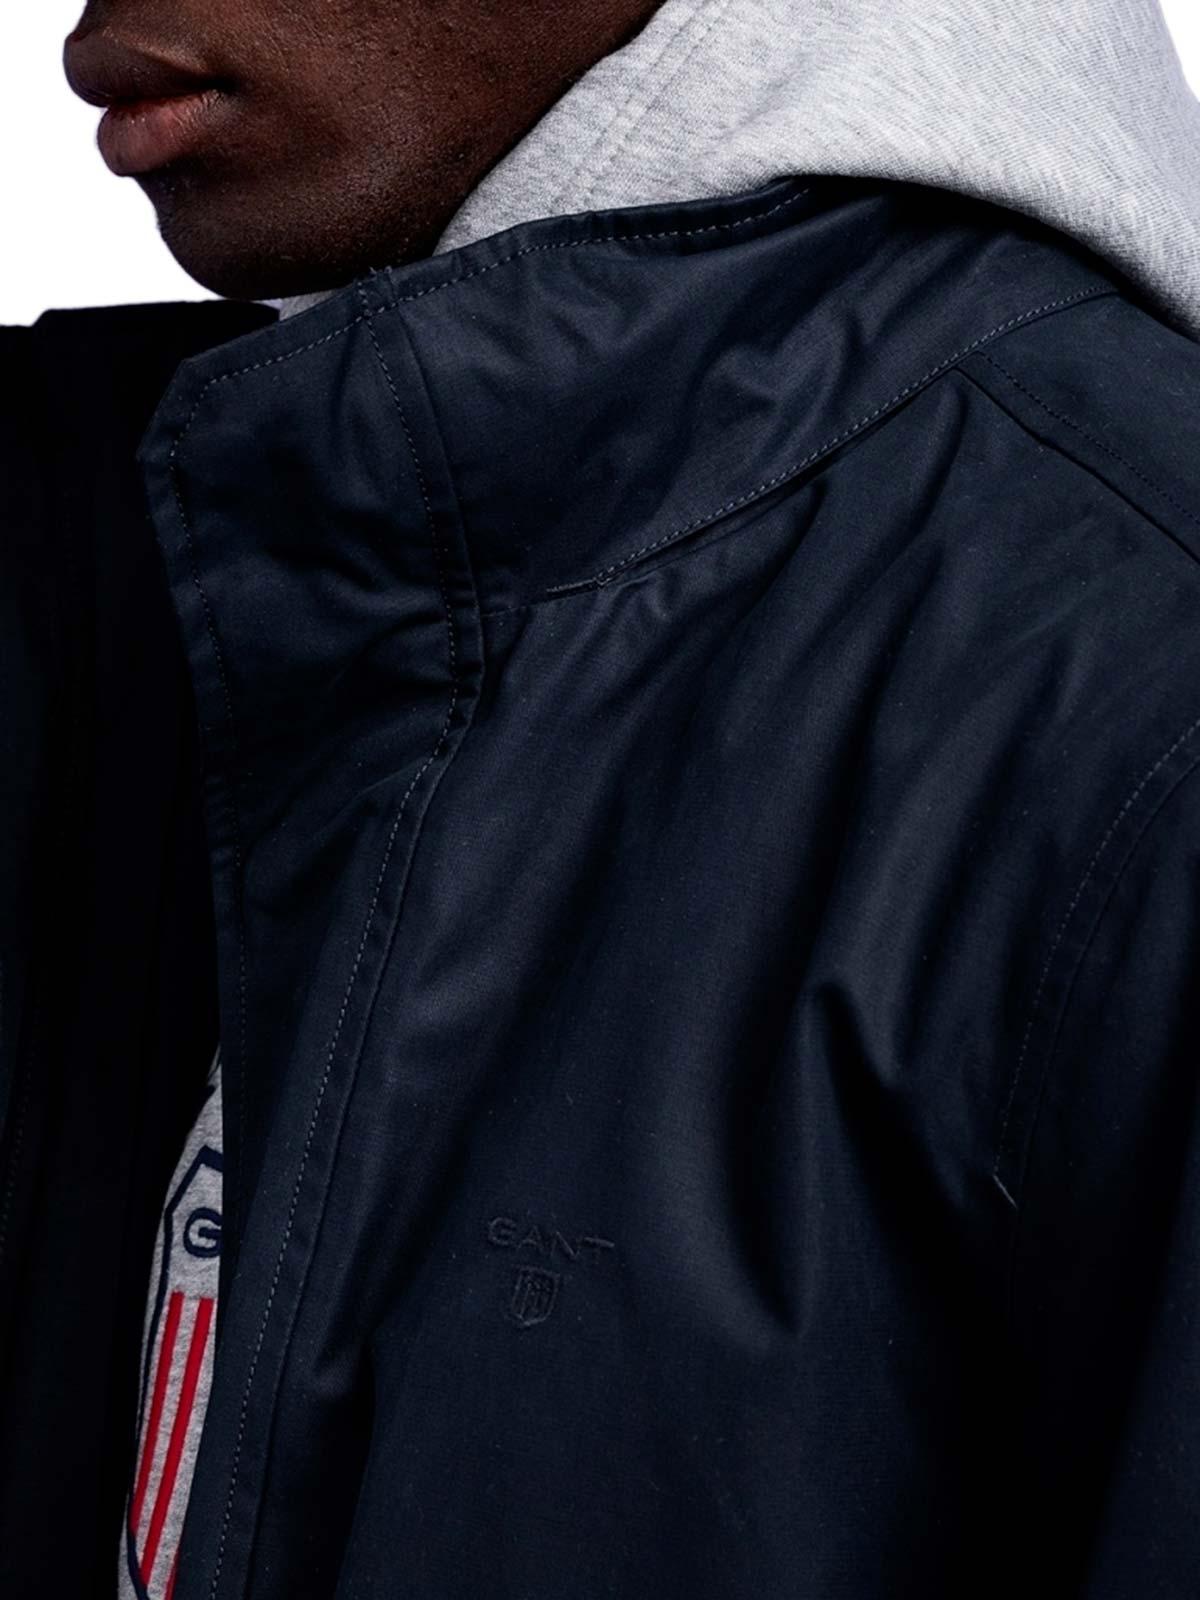 Picture of Gant | Giubbotti D1. The Gant Double Jacket